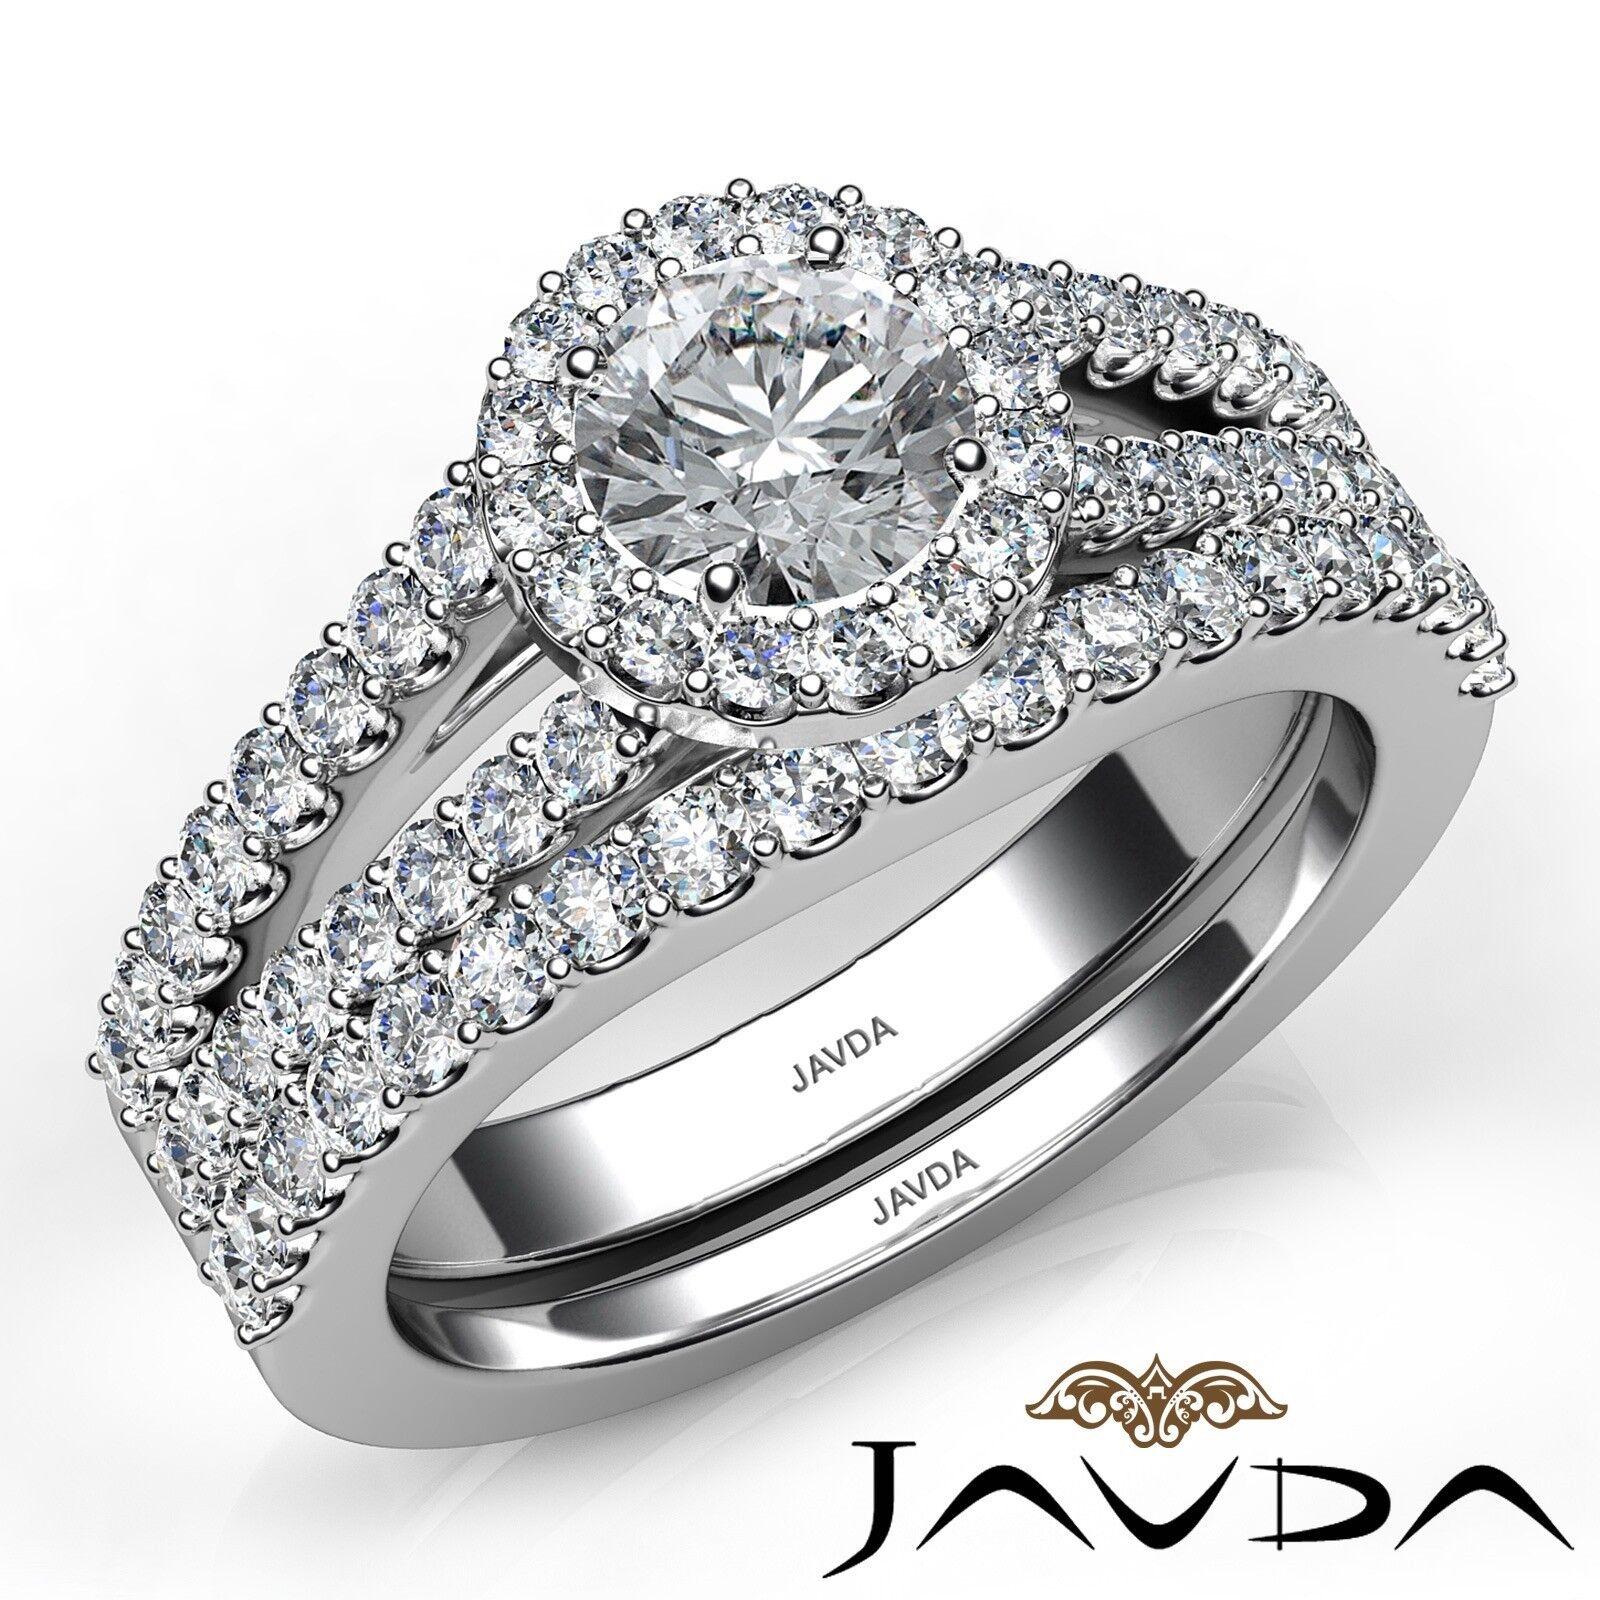 1.85ctw Luxurious Wedding Bridal Round Diamond Engagement Ring GIA G-VVS1 W Gold 1